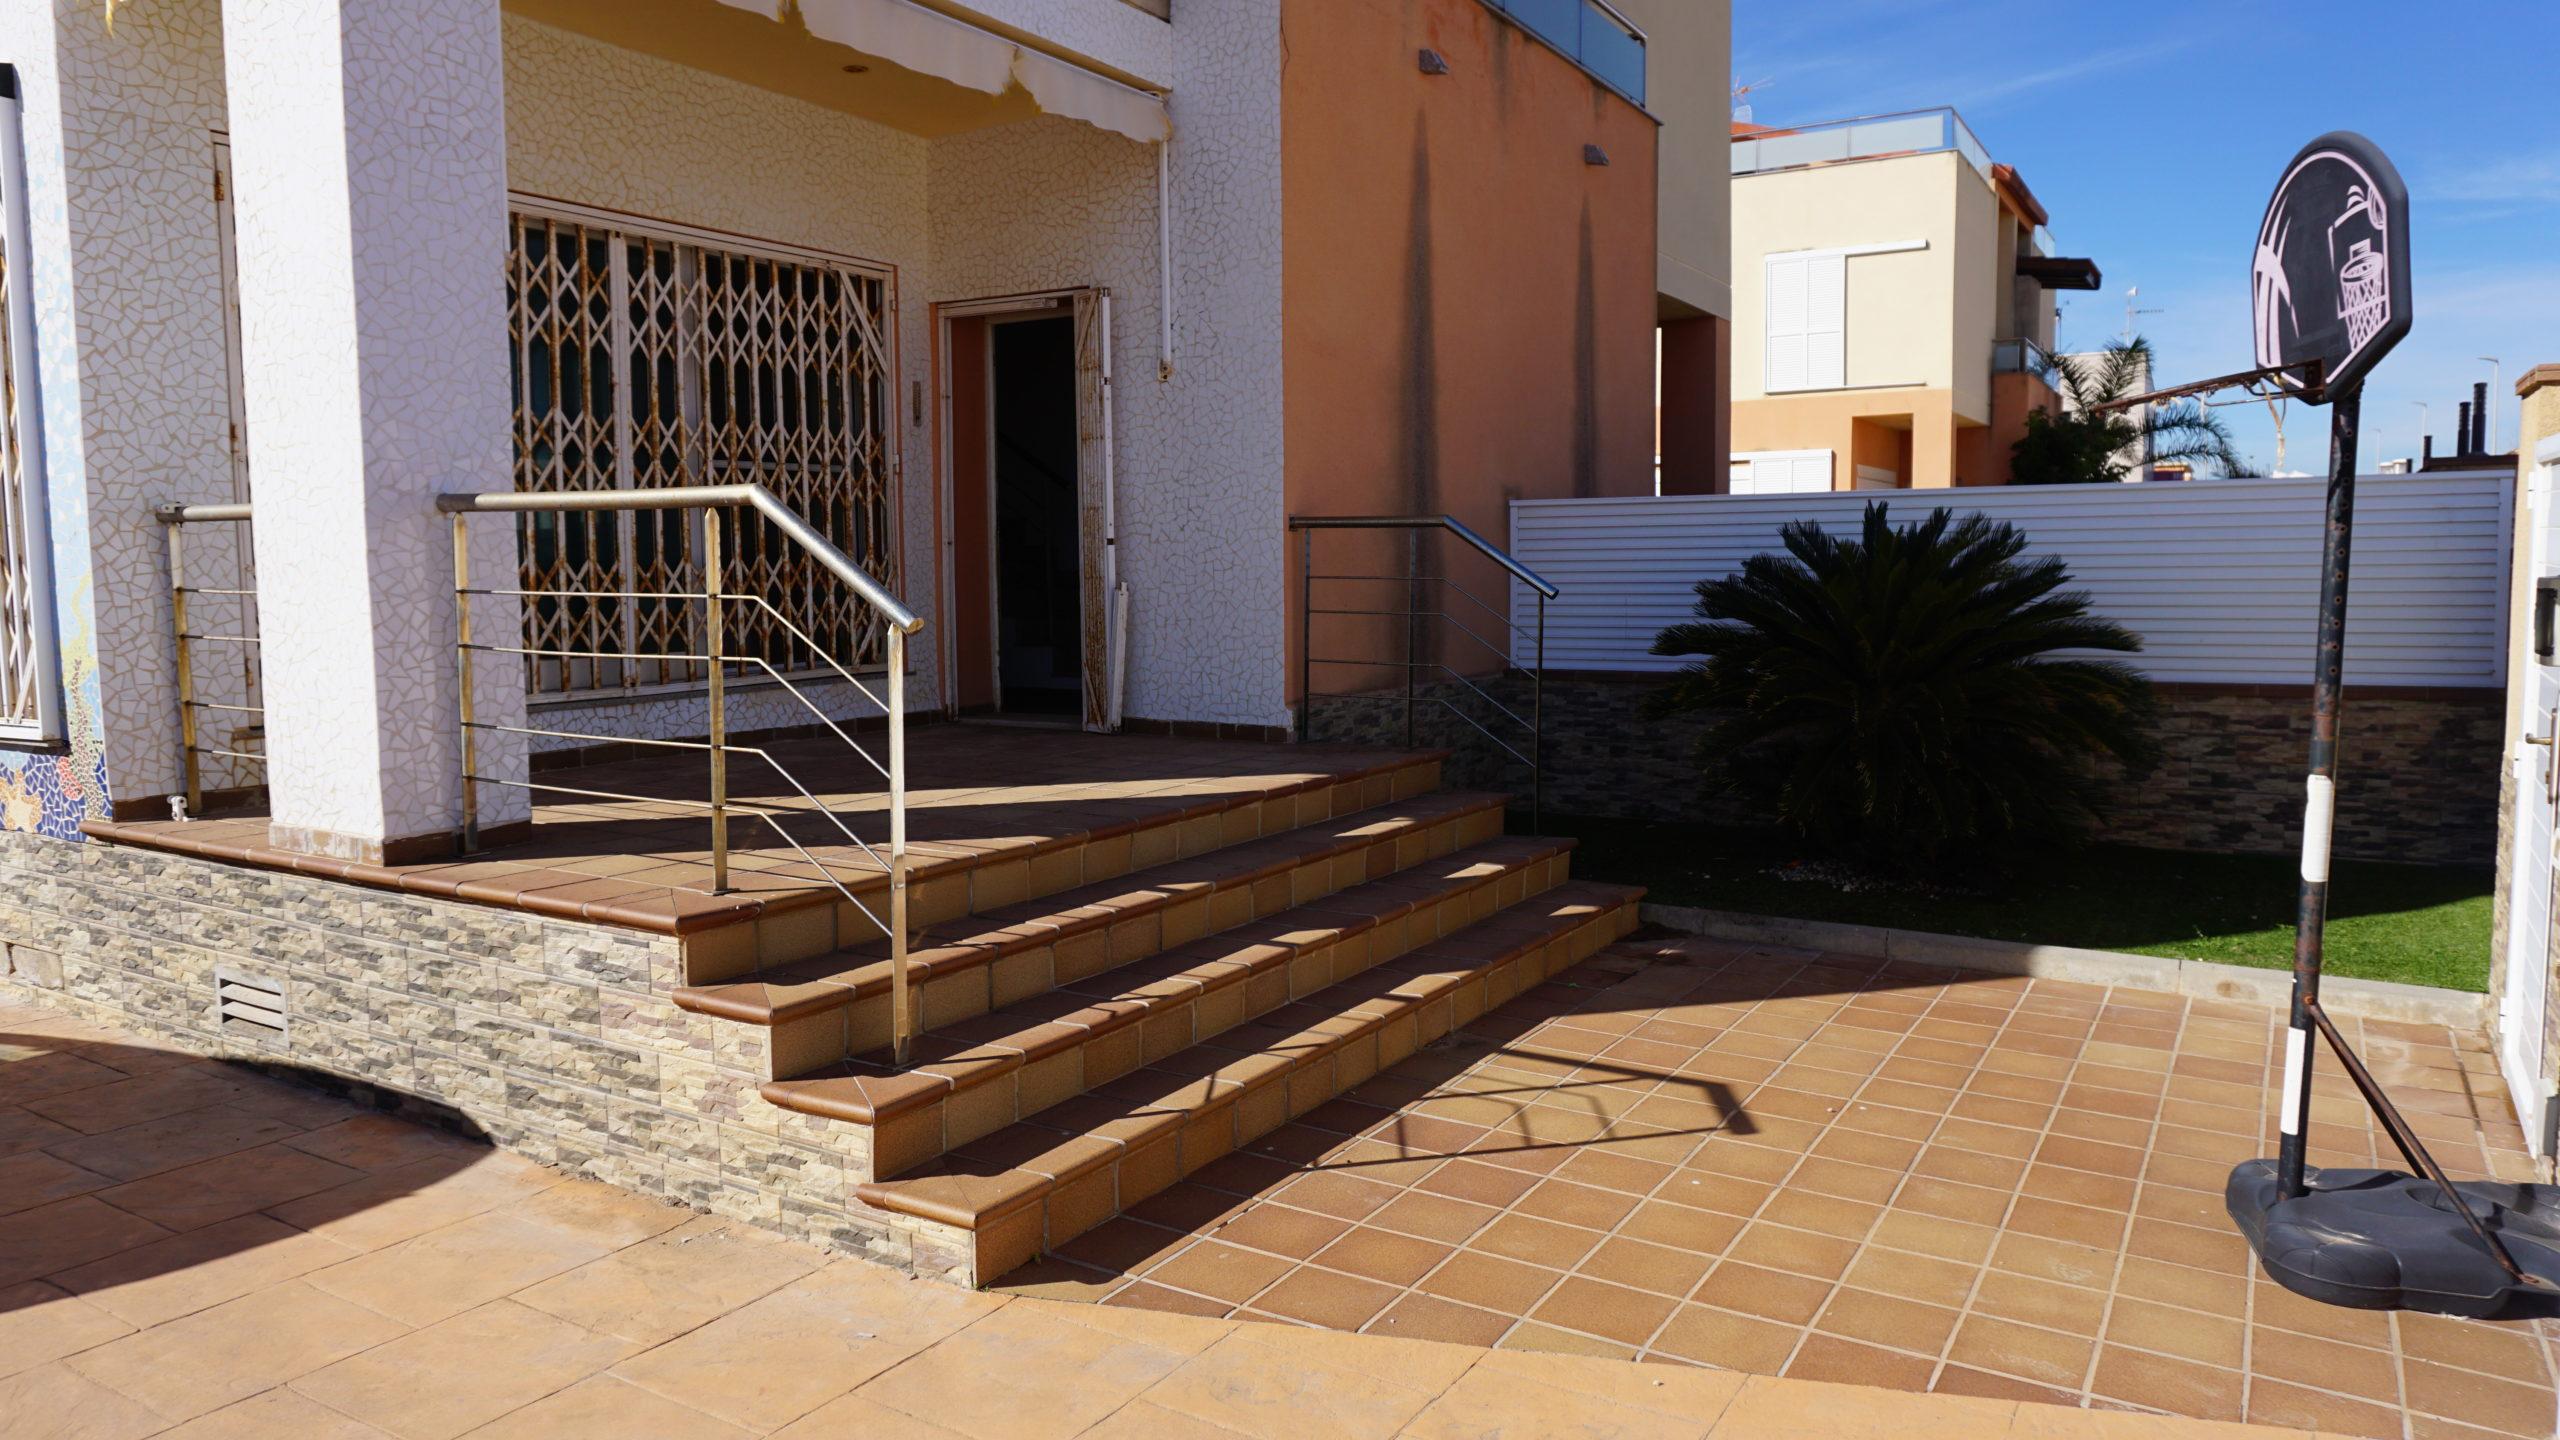 Chalet en Venta en Burriana (Castellón) Zona Serratella